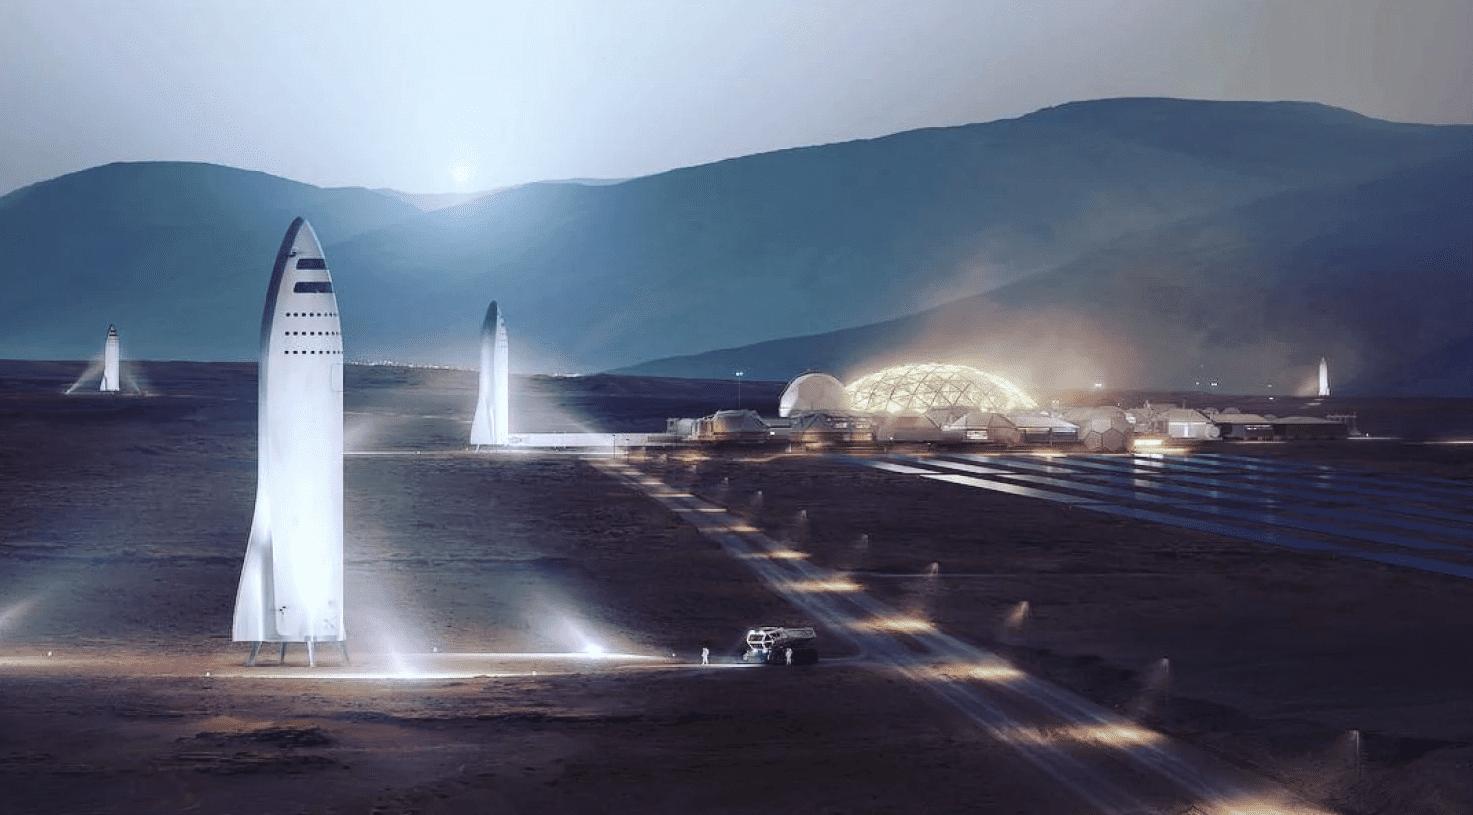 mars landing spacex - photo #12